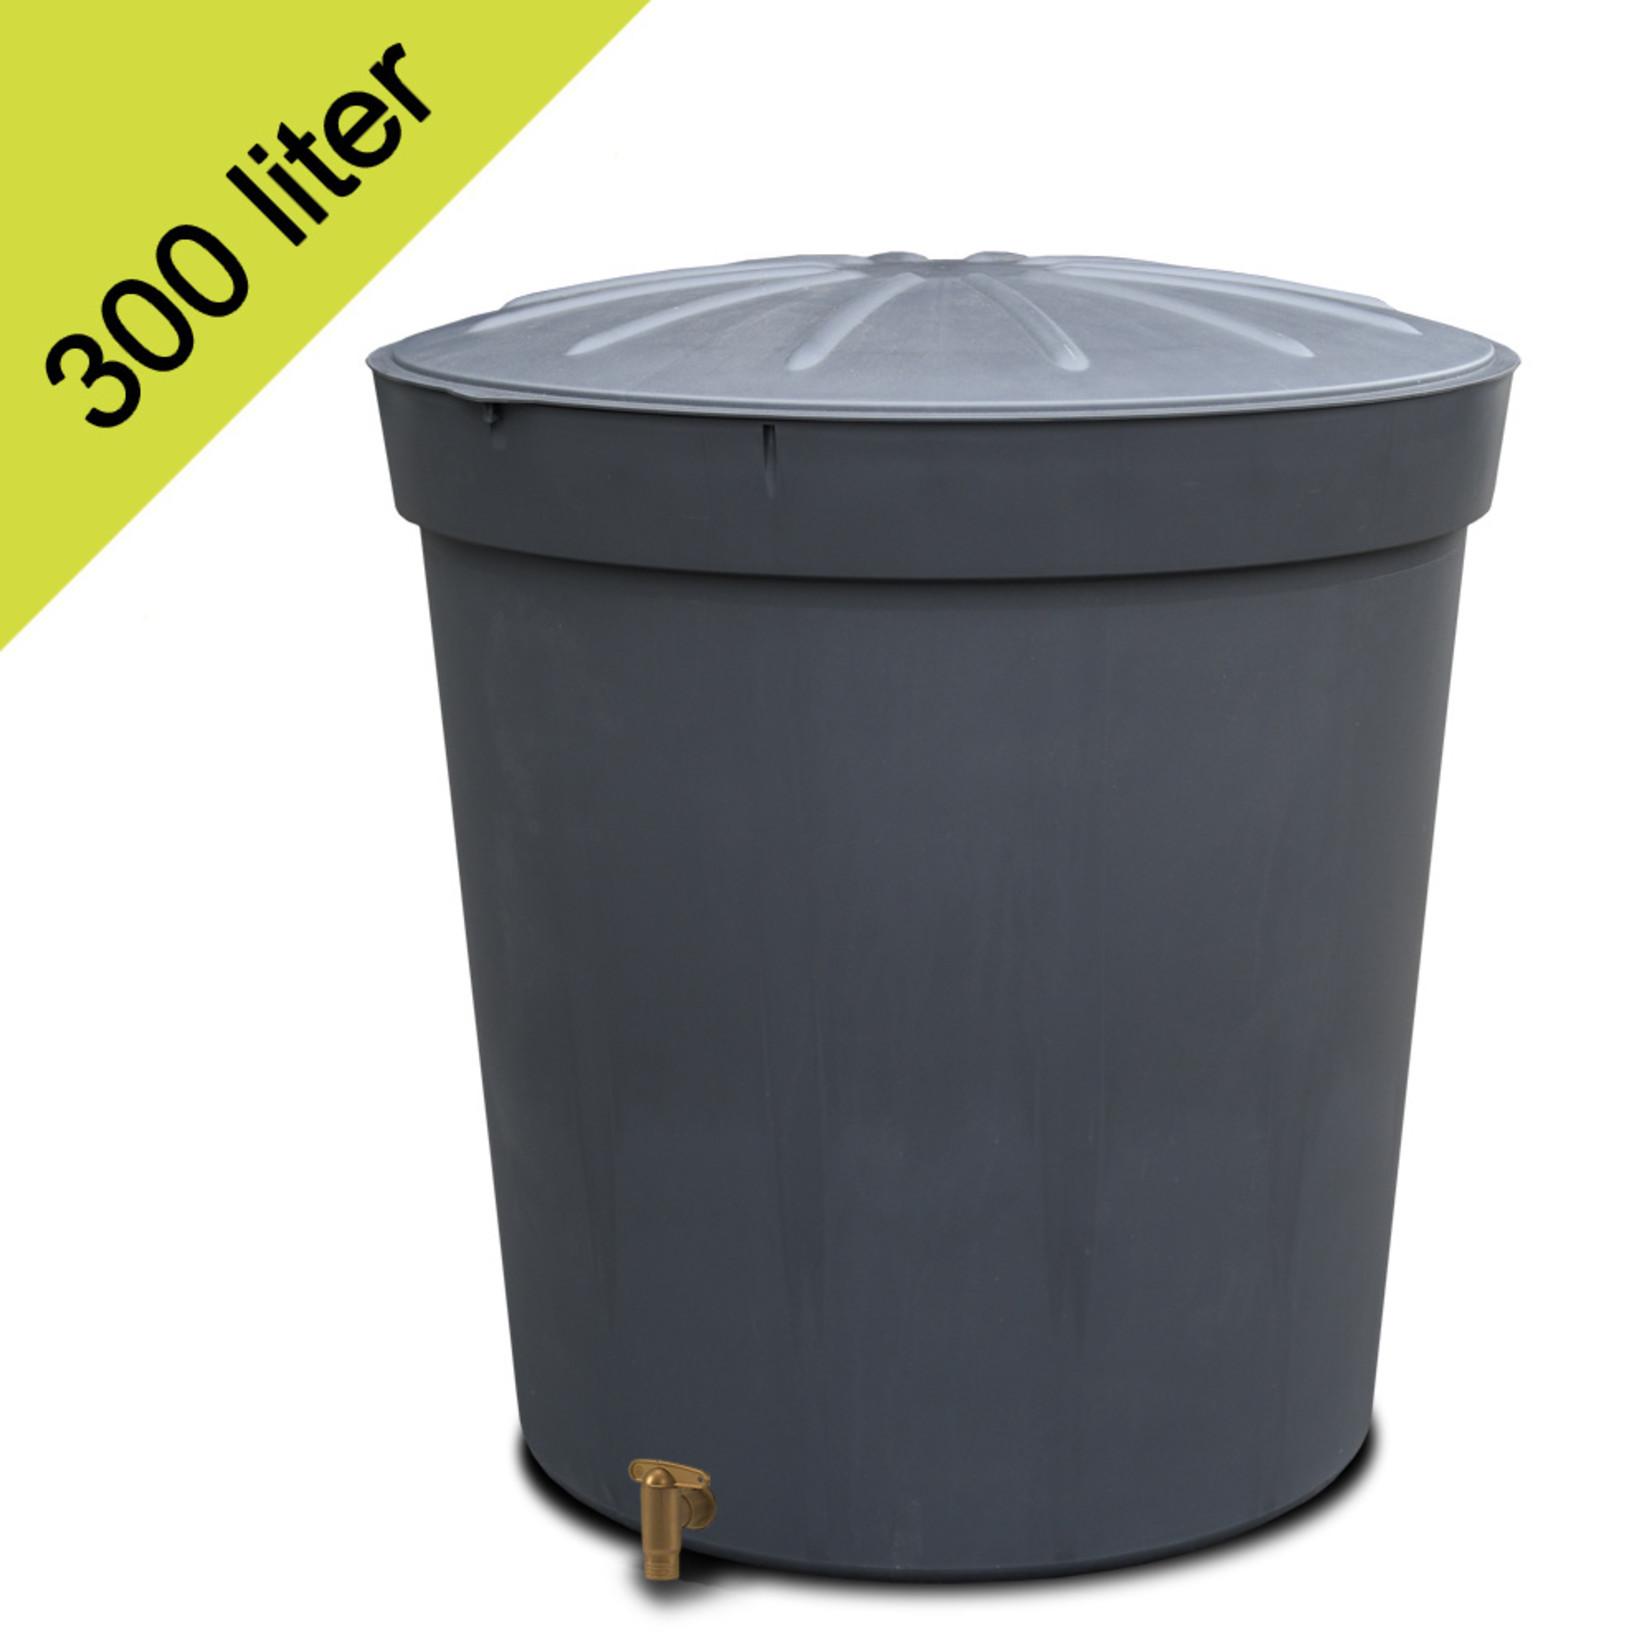 Garantia Lanzarote regenton 300 liter antraciet